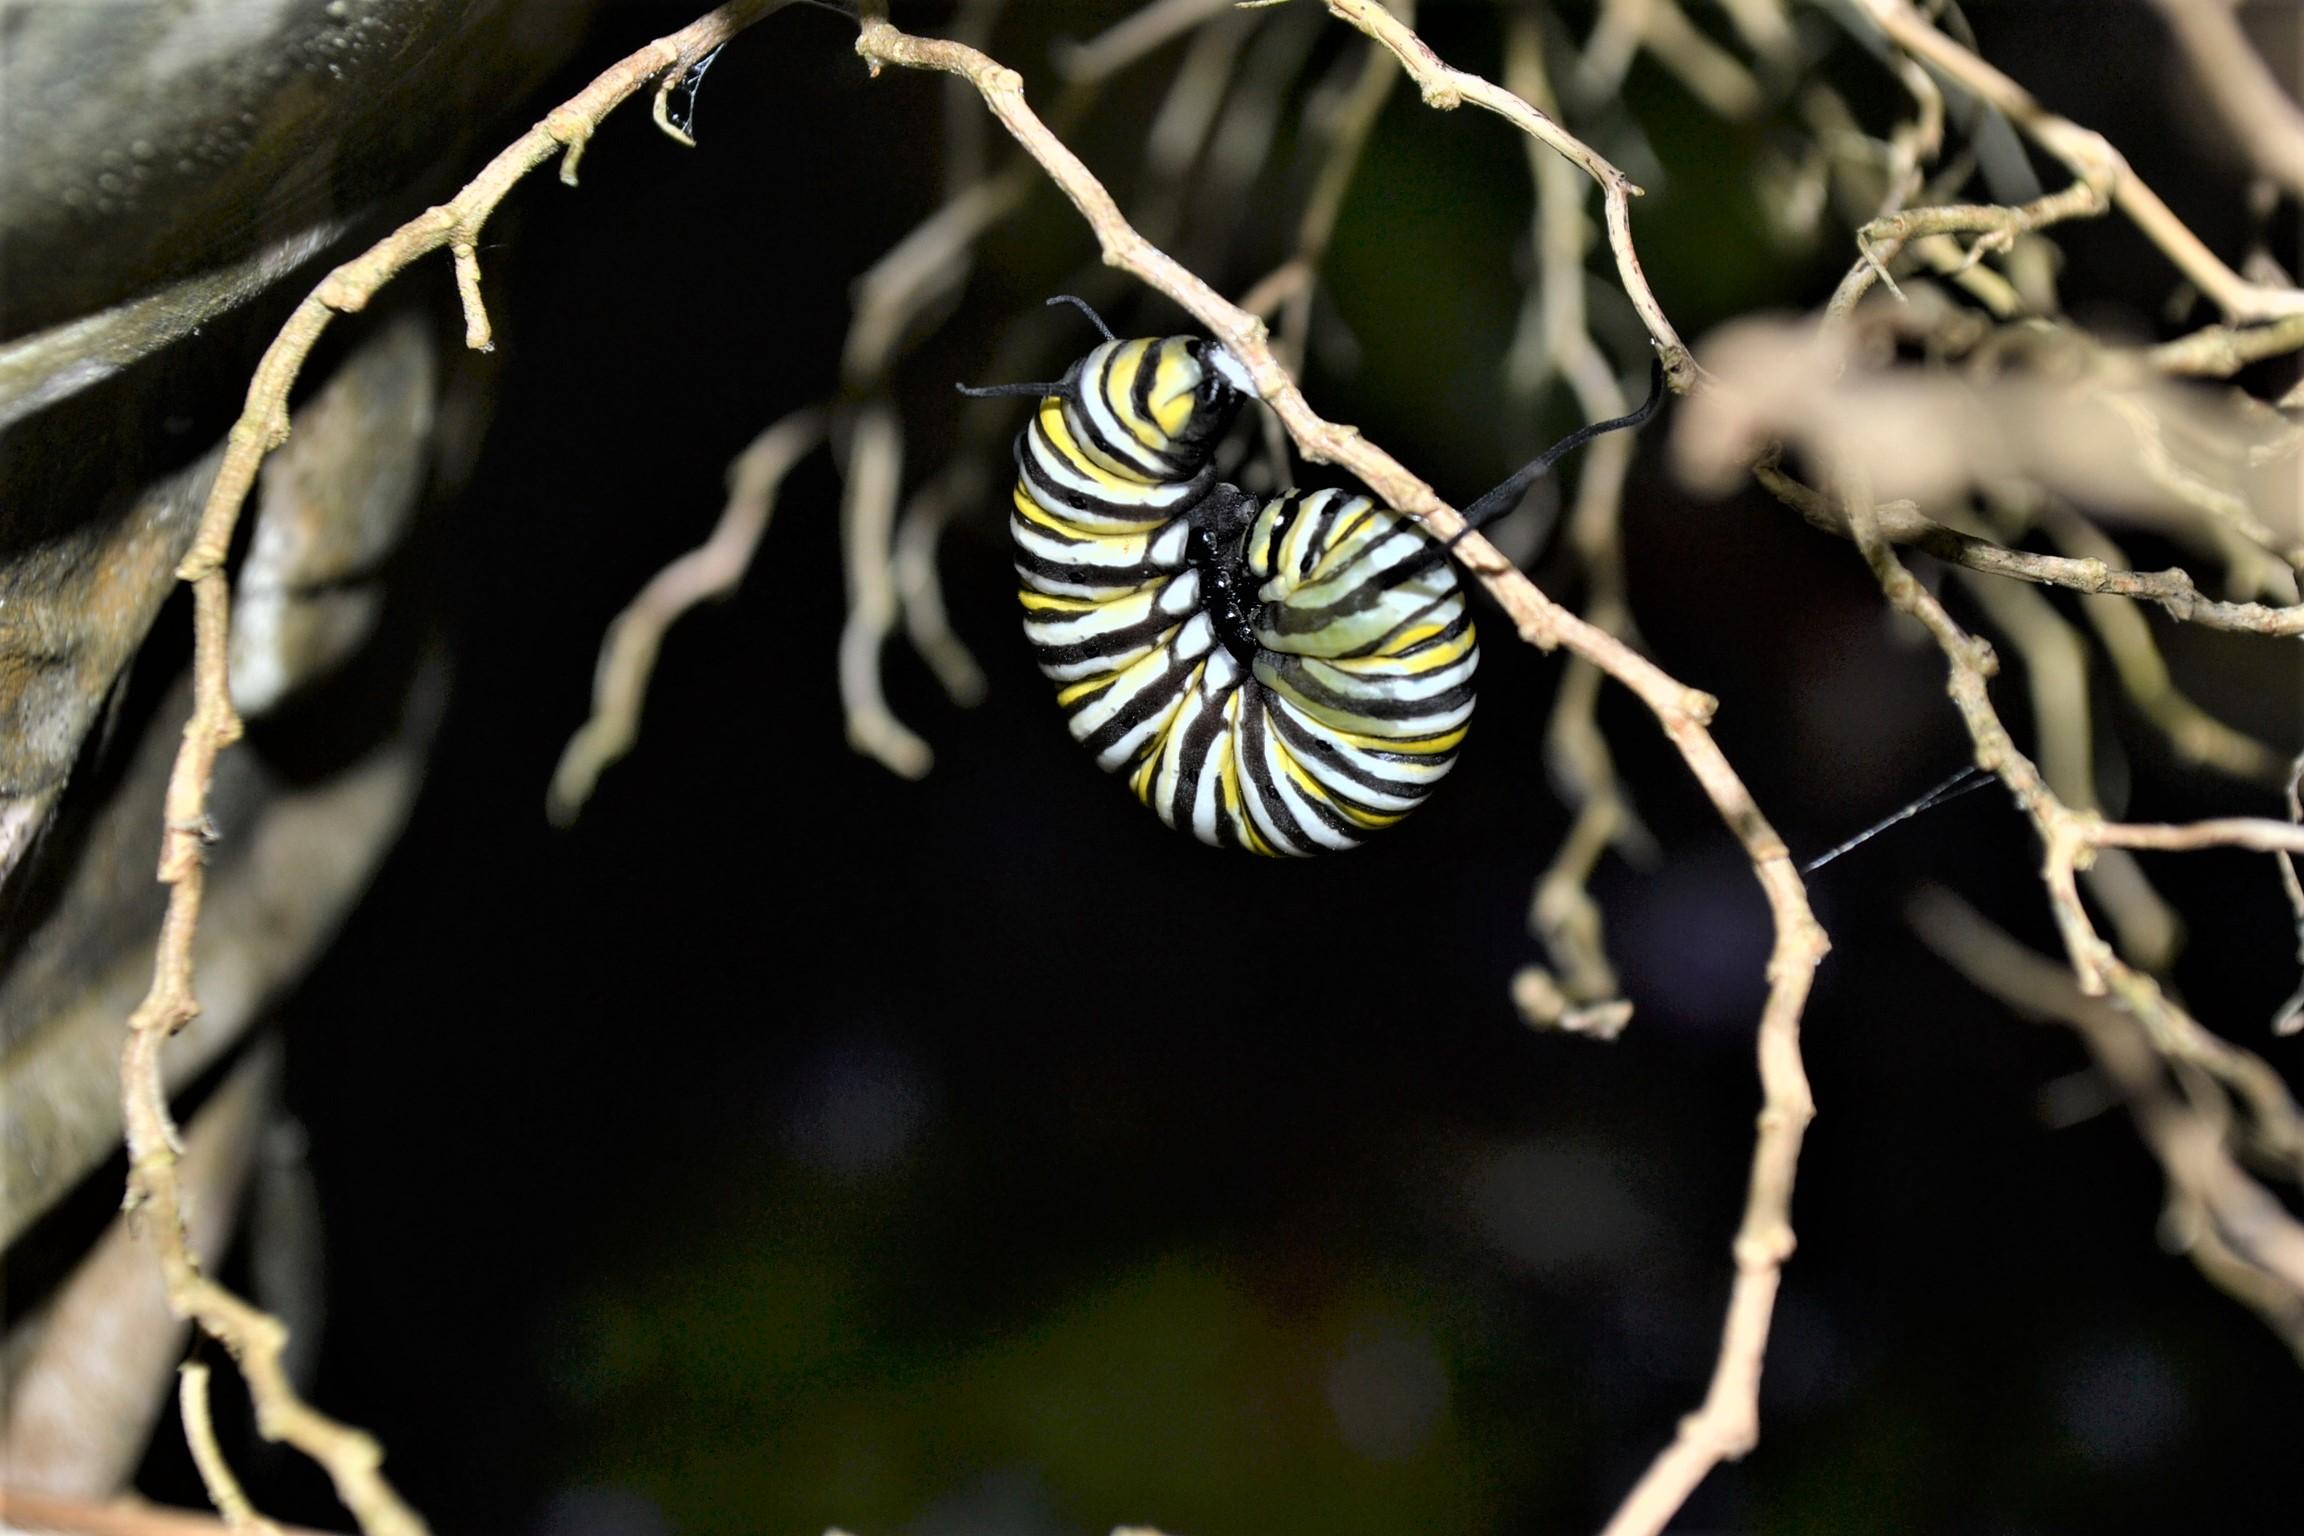 Caterpillar preparing to cocoon.